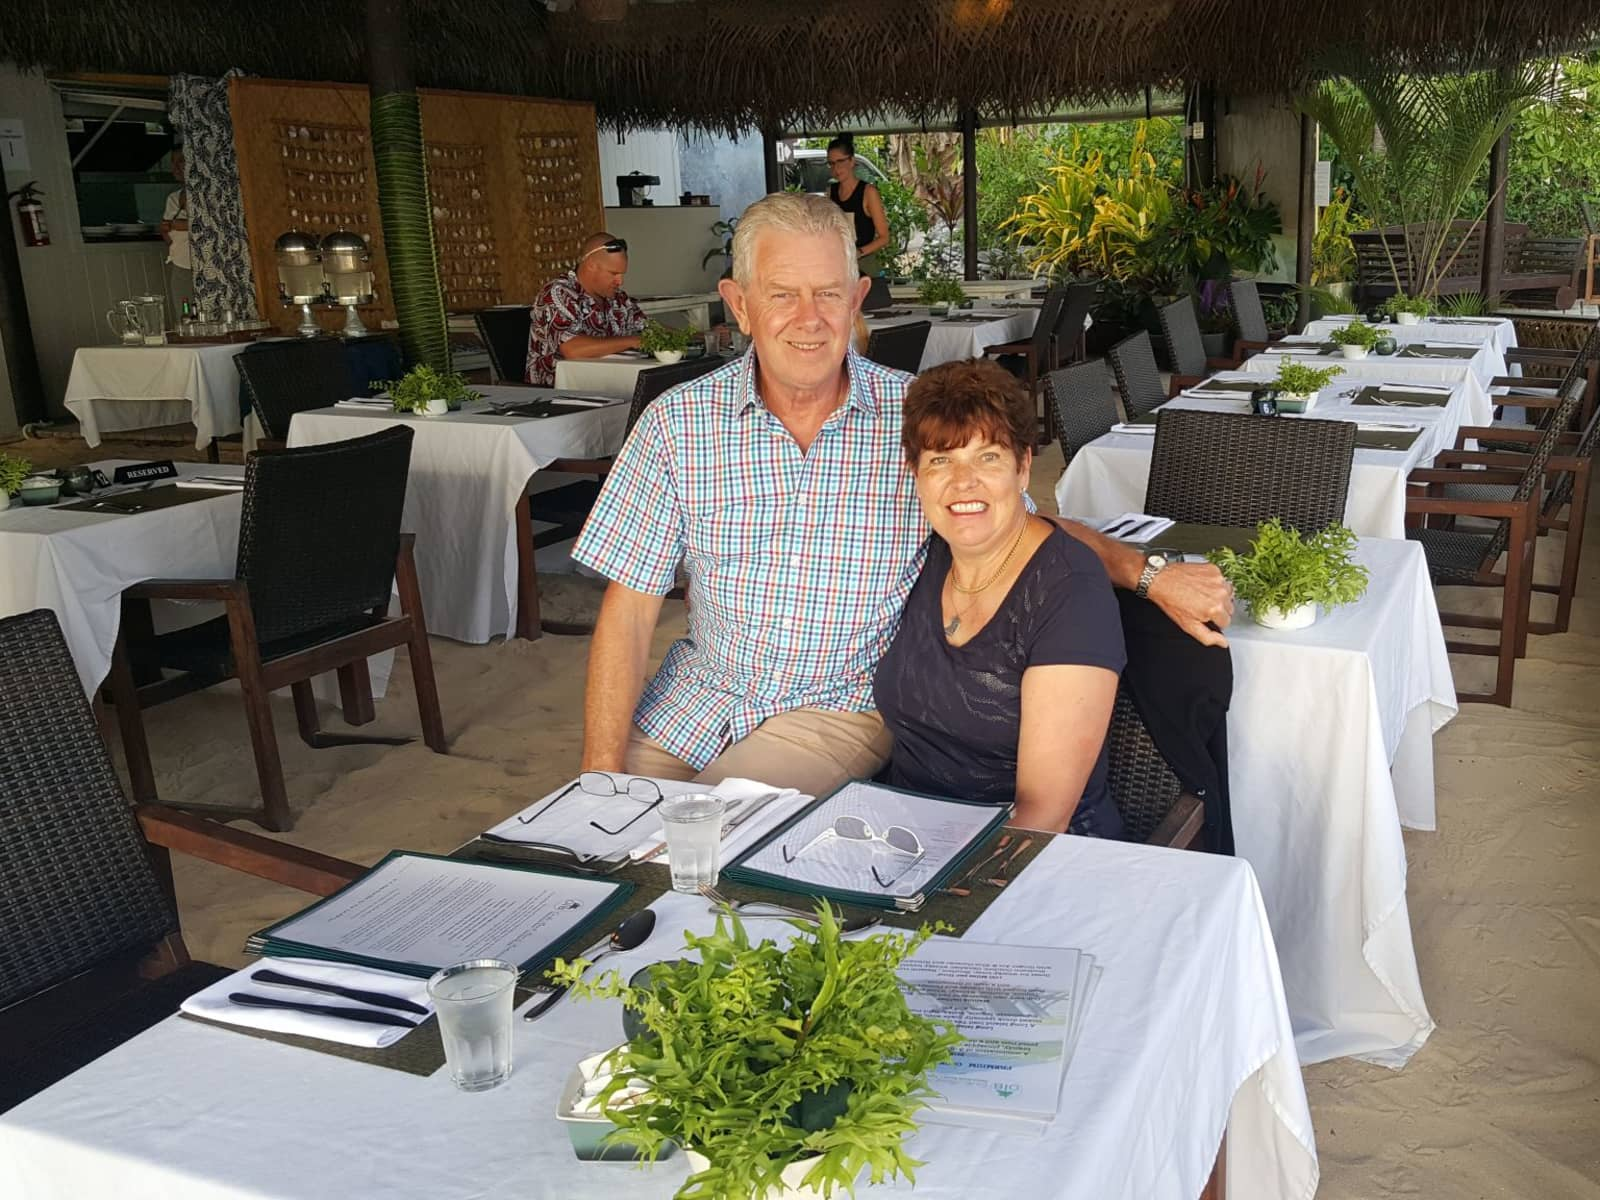 David & Renata from Cambridge, New Zealand